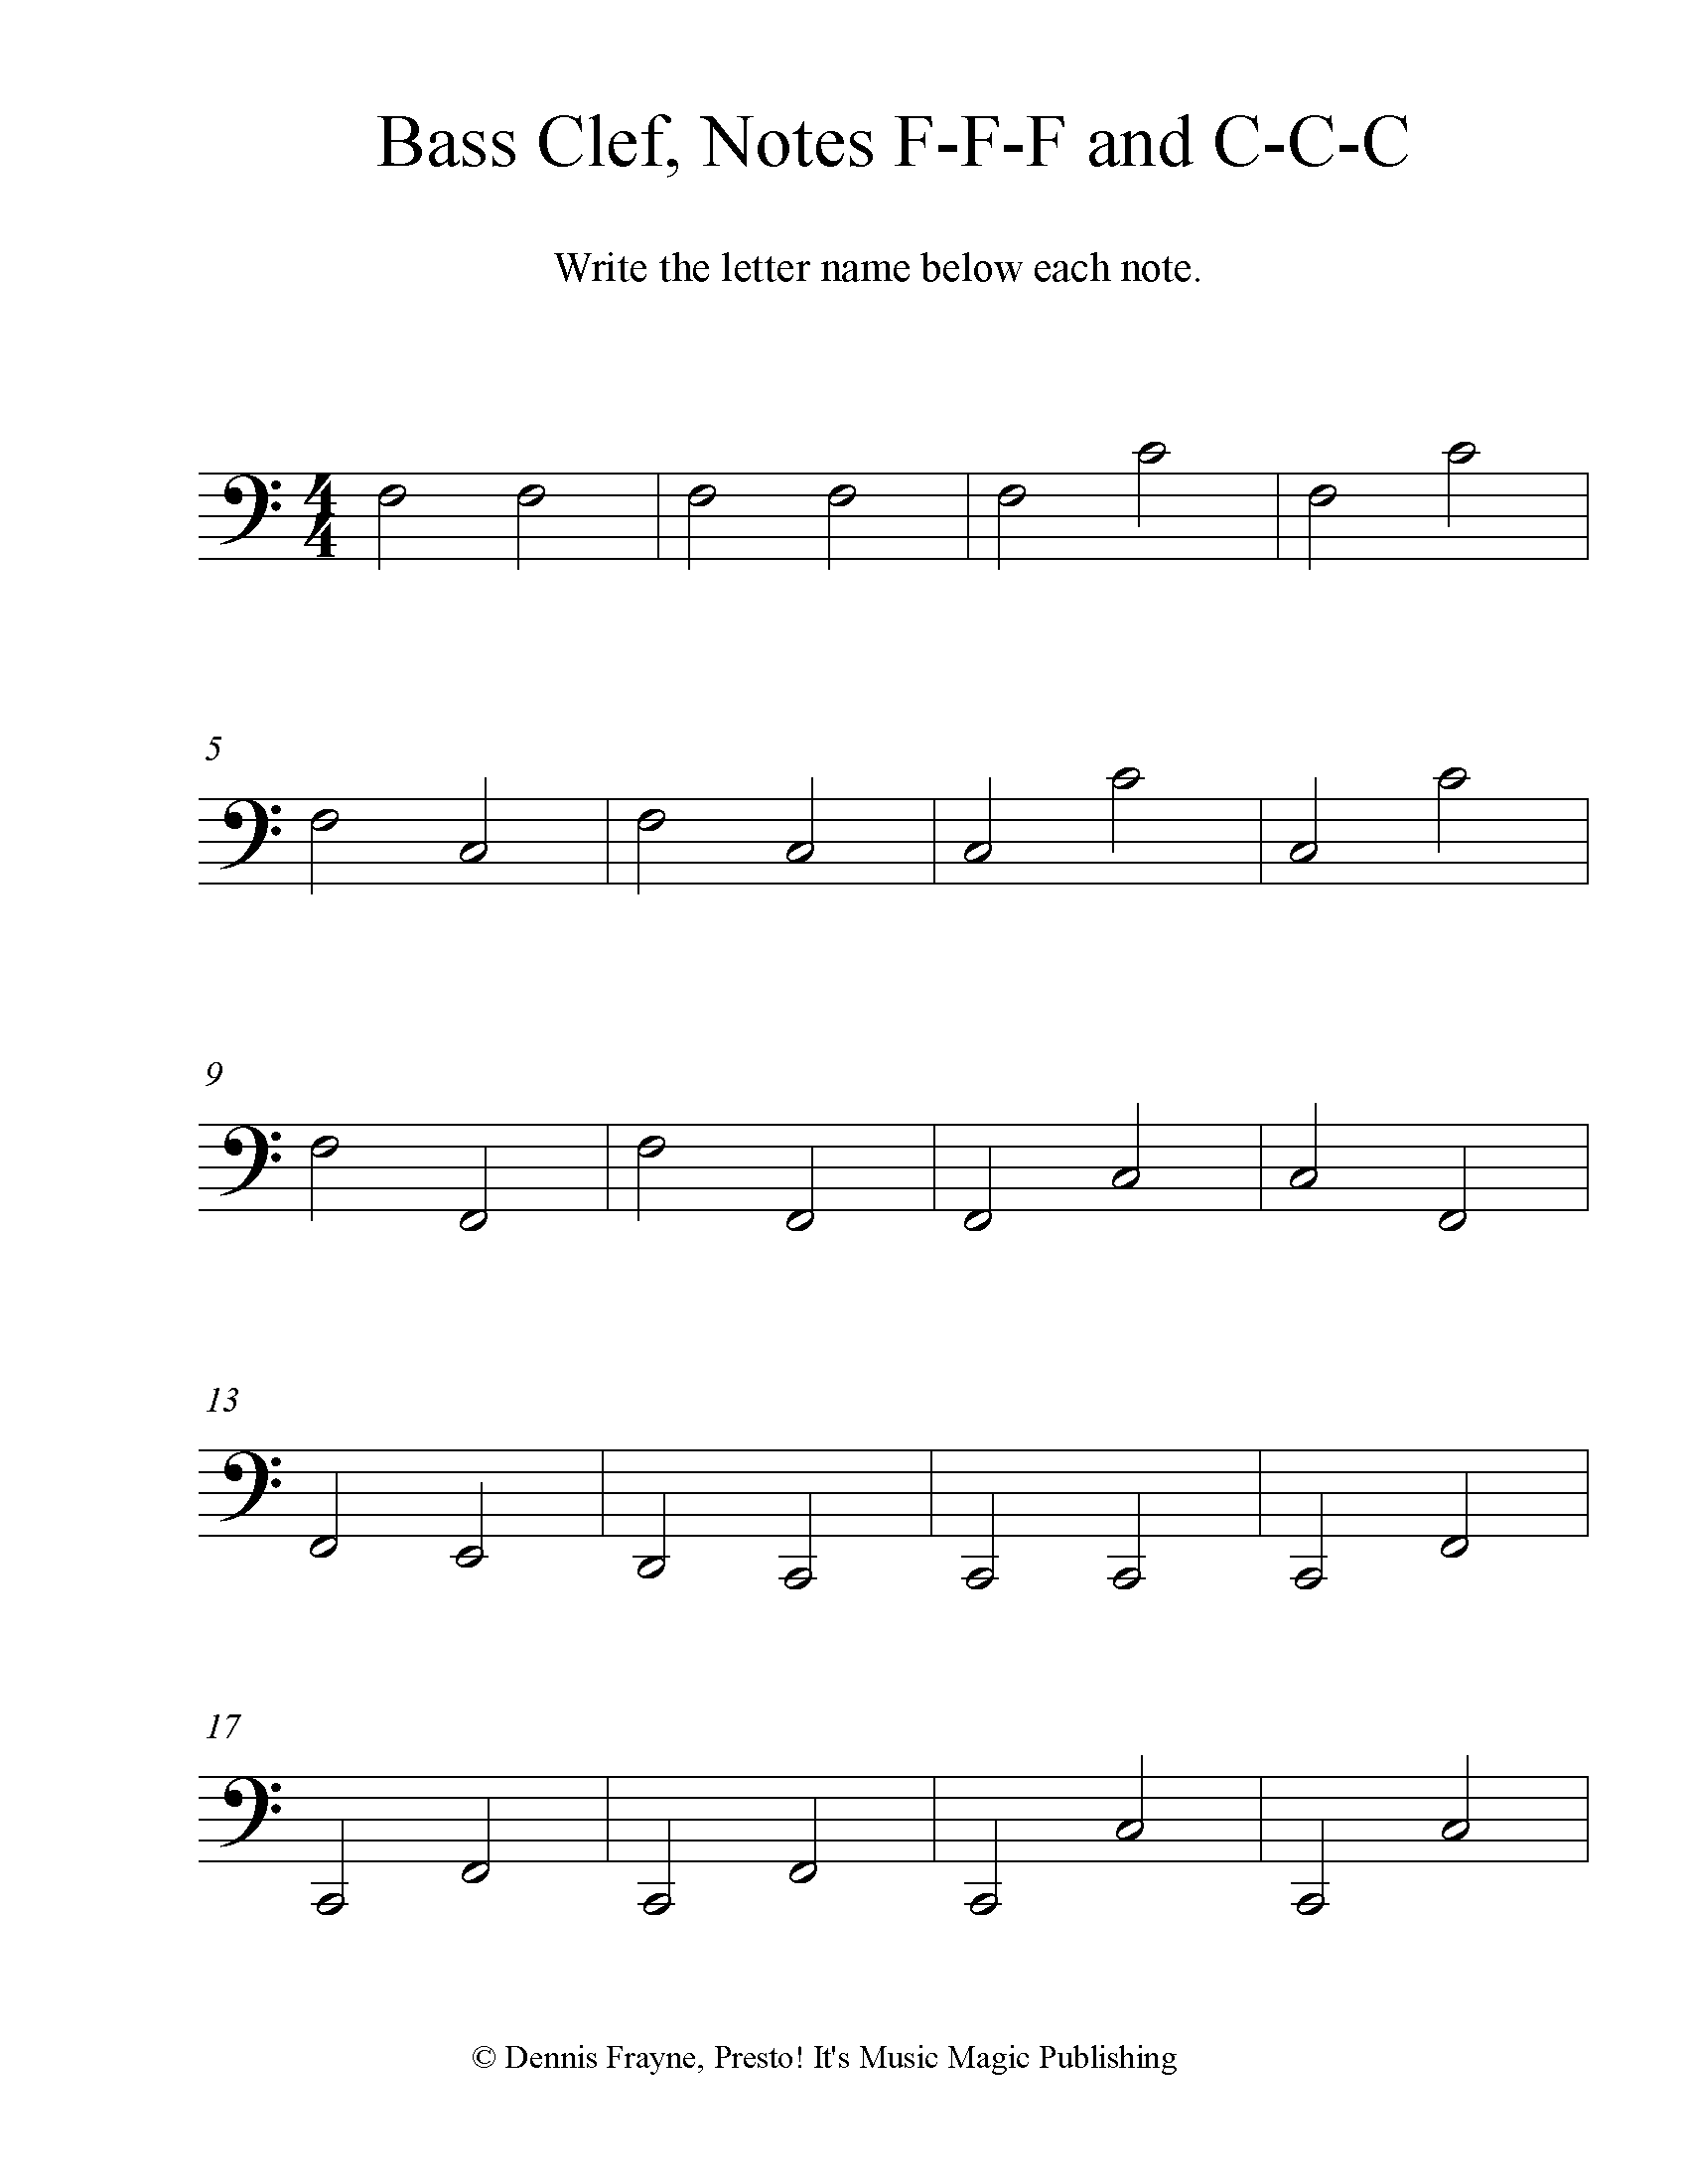 FREE! Printable Music Note Naming Worksheets — Presto! It